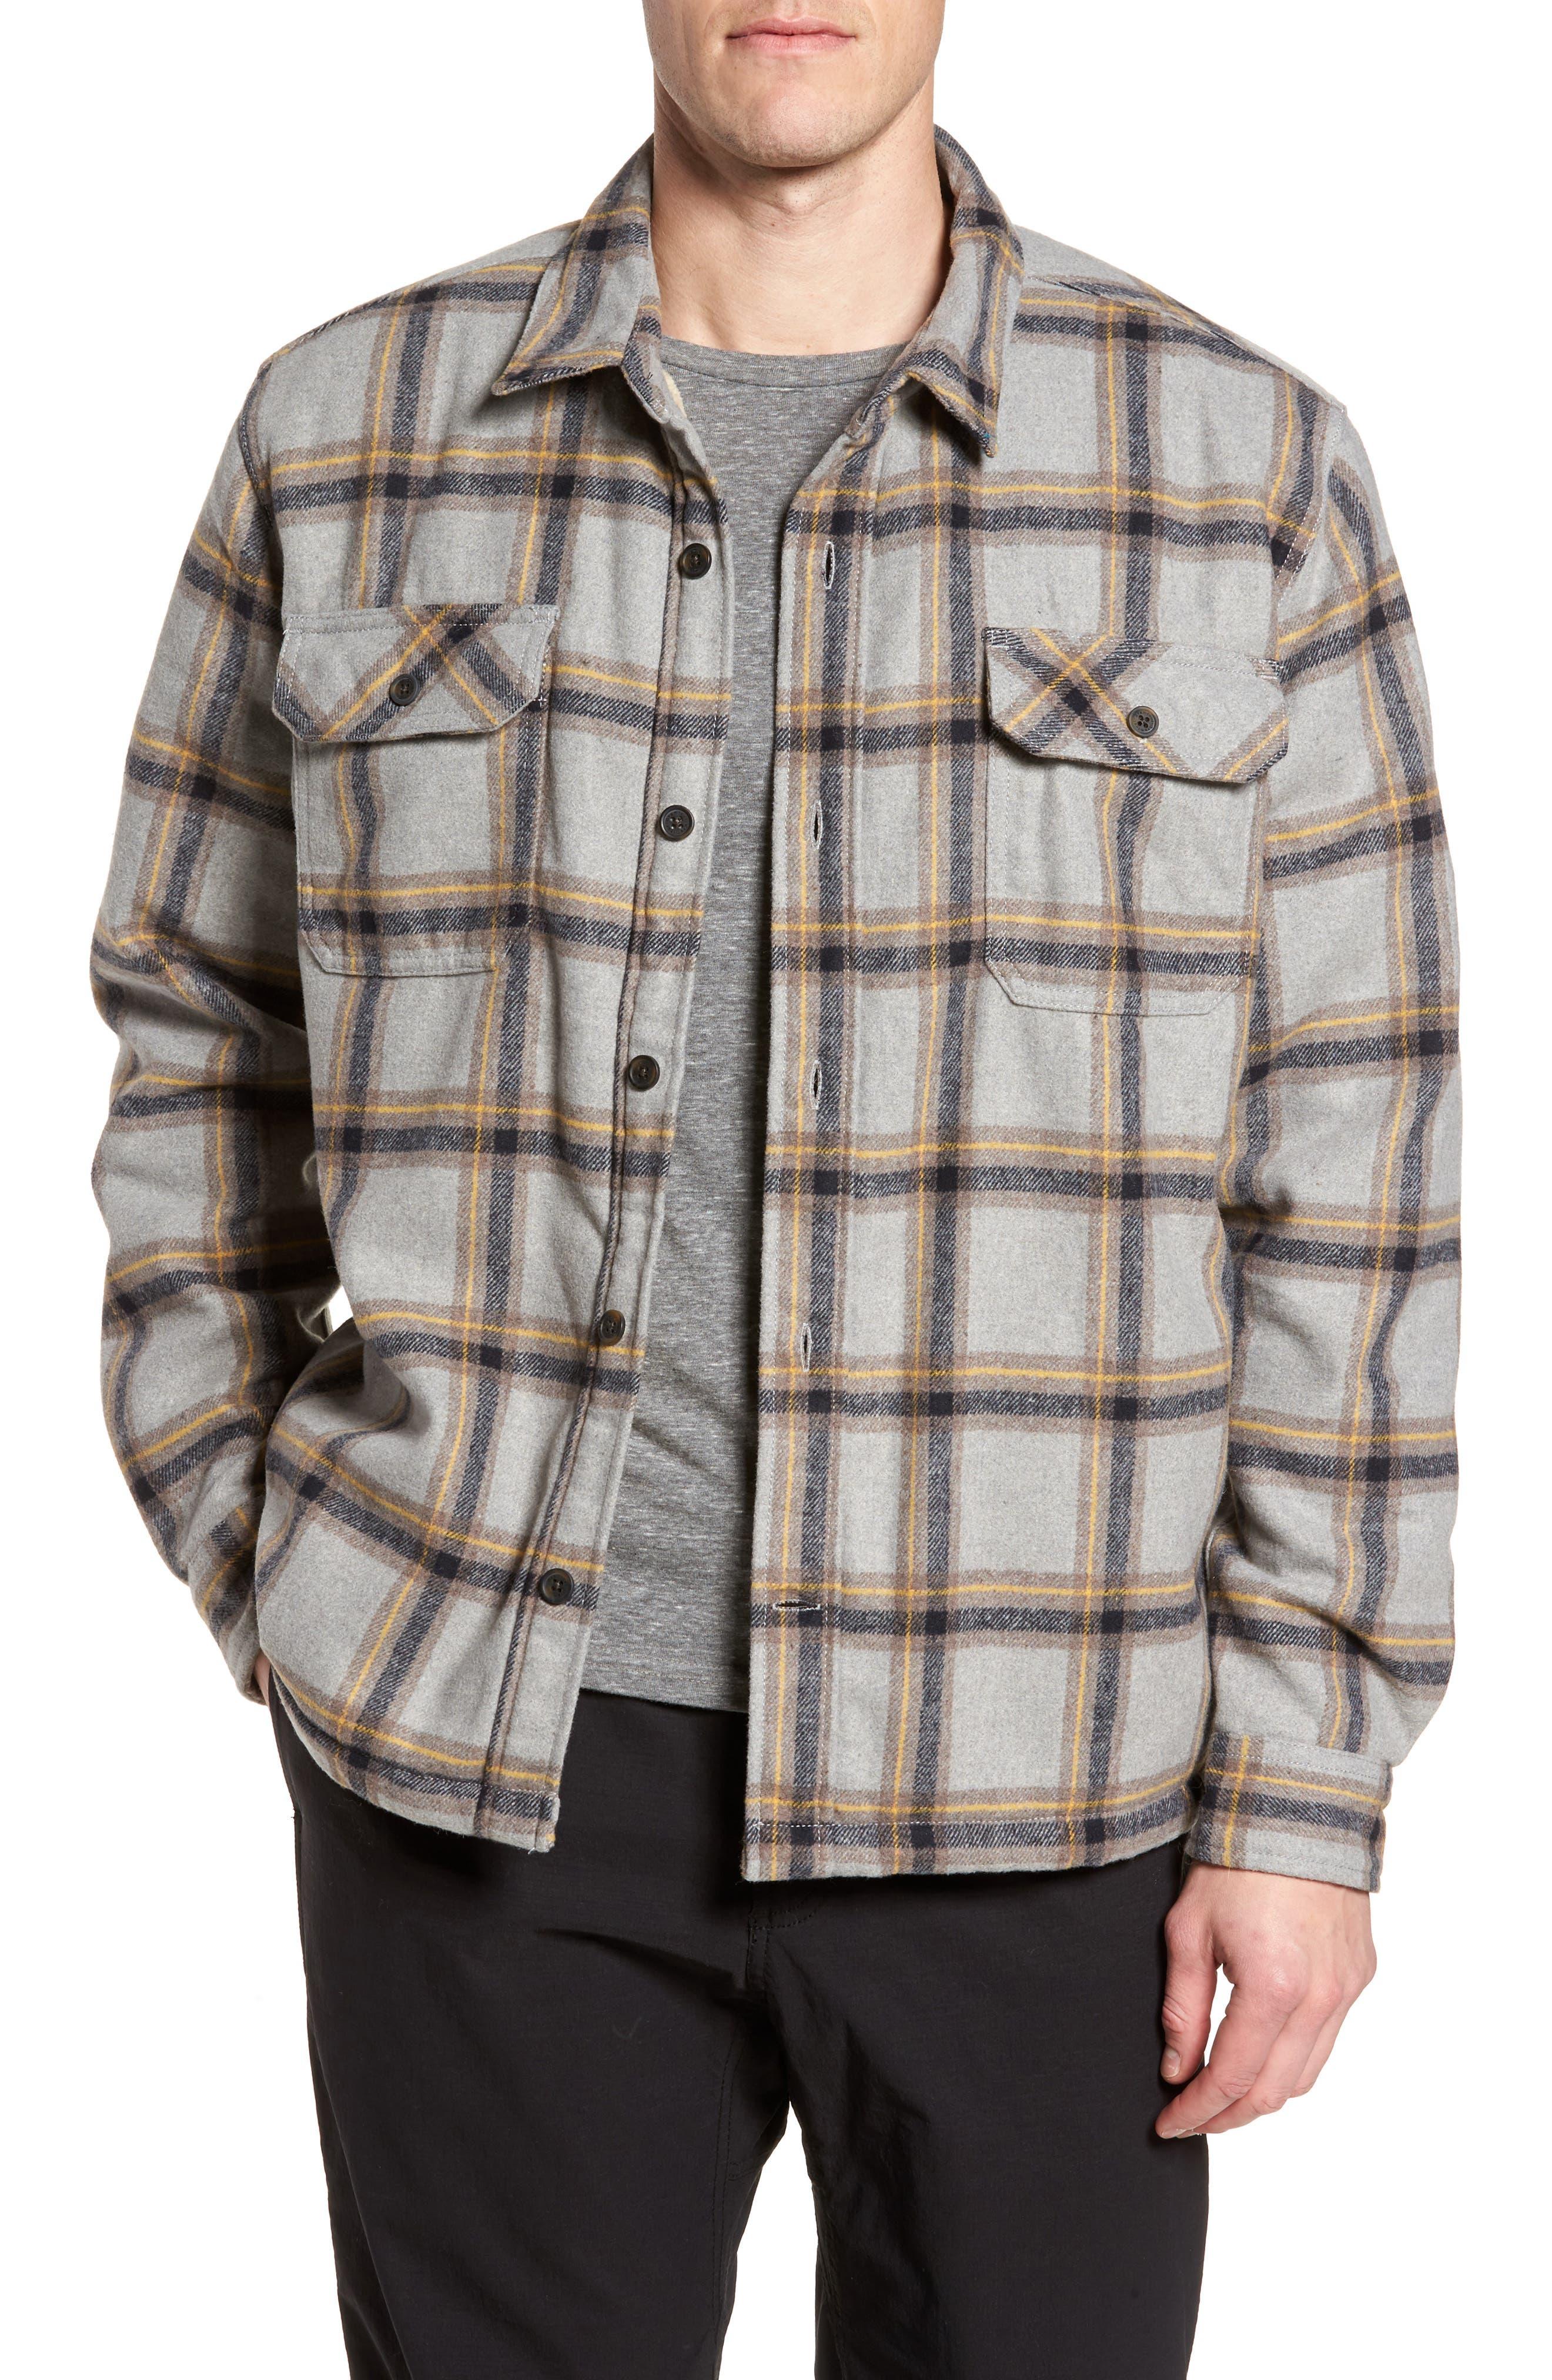 Tough Guy Plush Lined Flannel Shirt Jacket,                             Main thumbnail 1, color,                             Light Grey